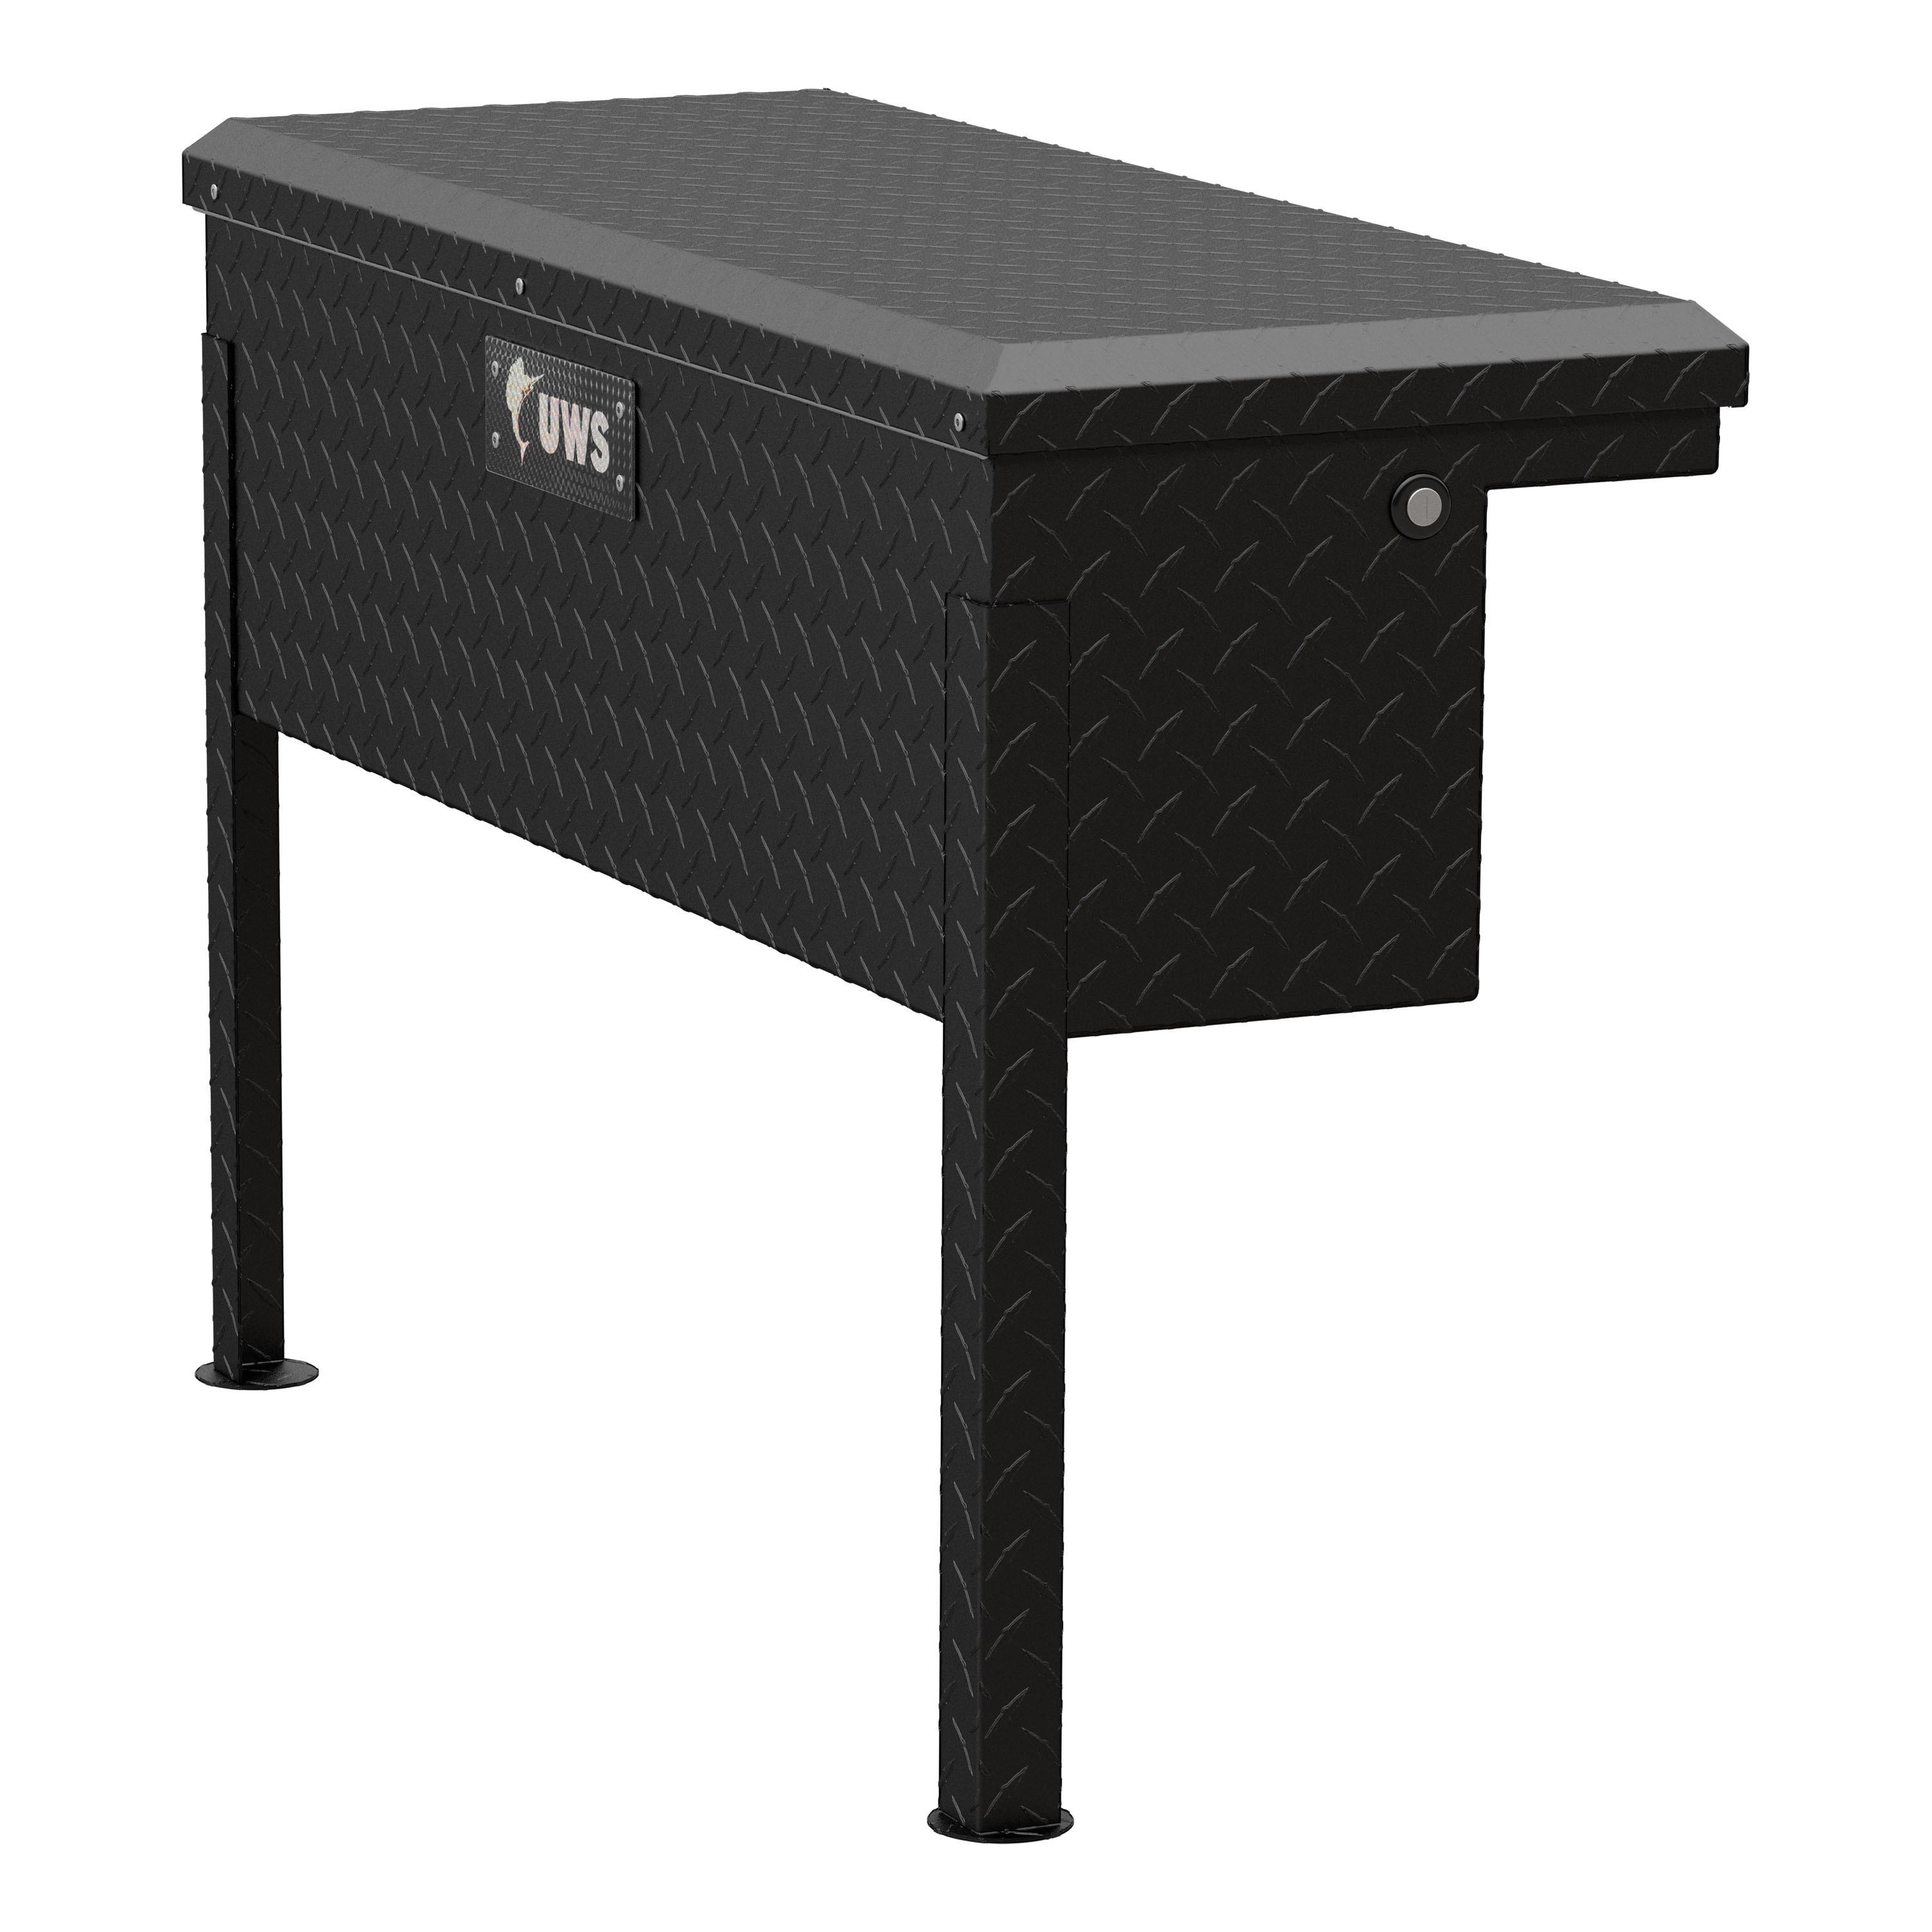 UWS TBSM-36-LP-MB Tool Box  Side Mount; Low Profile; Single Lid; Diamond Tread; Matte Black; Aluminum; 36-7/8 Inch Length x 14-3/8 Inch Width x 12-1/4 Inch Height - image 1 of 1